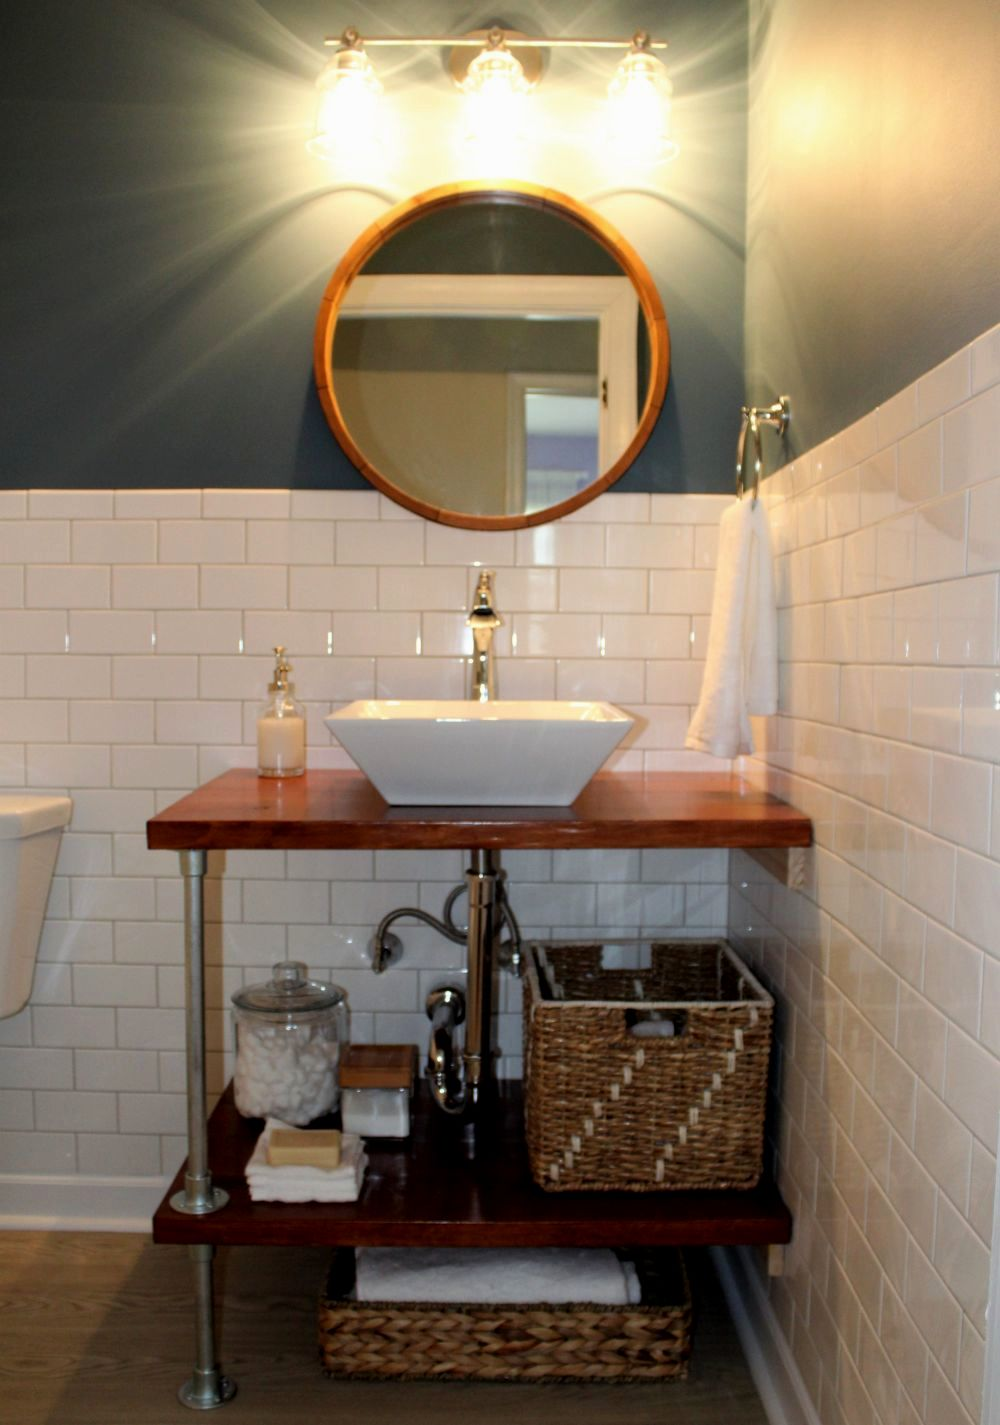 beautiful furniture bathroom vanity image-Amazing Furniture Bathroom Vanity Concept